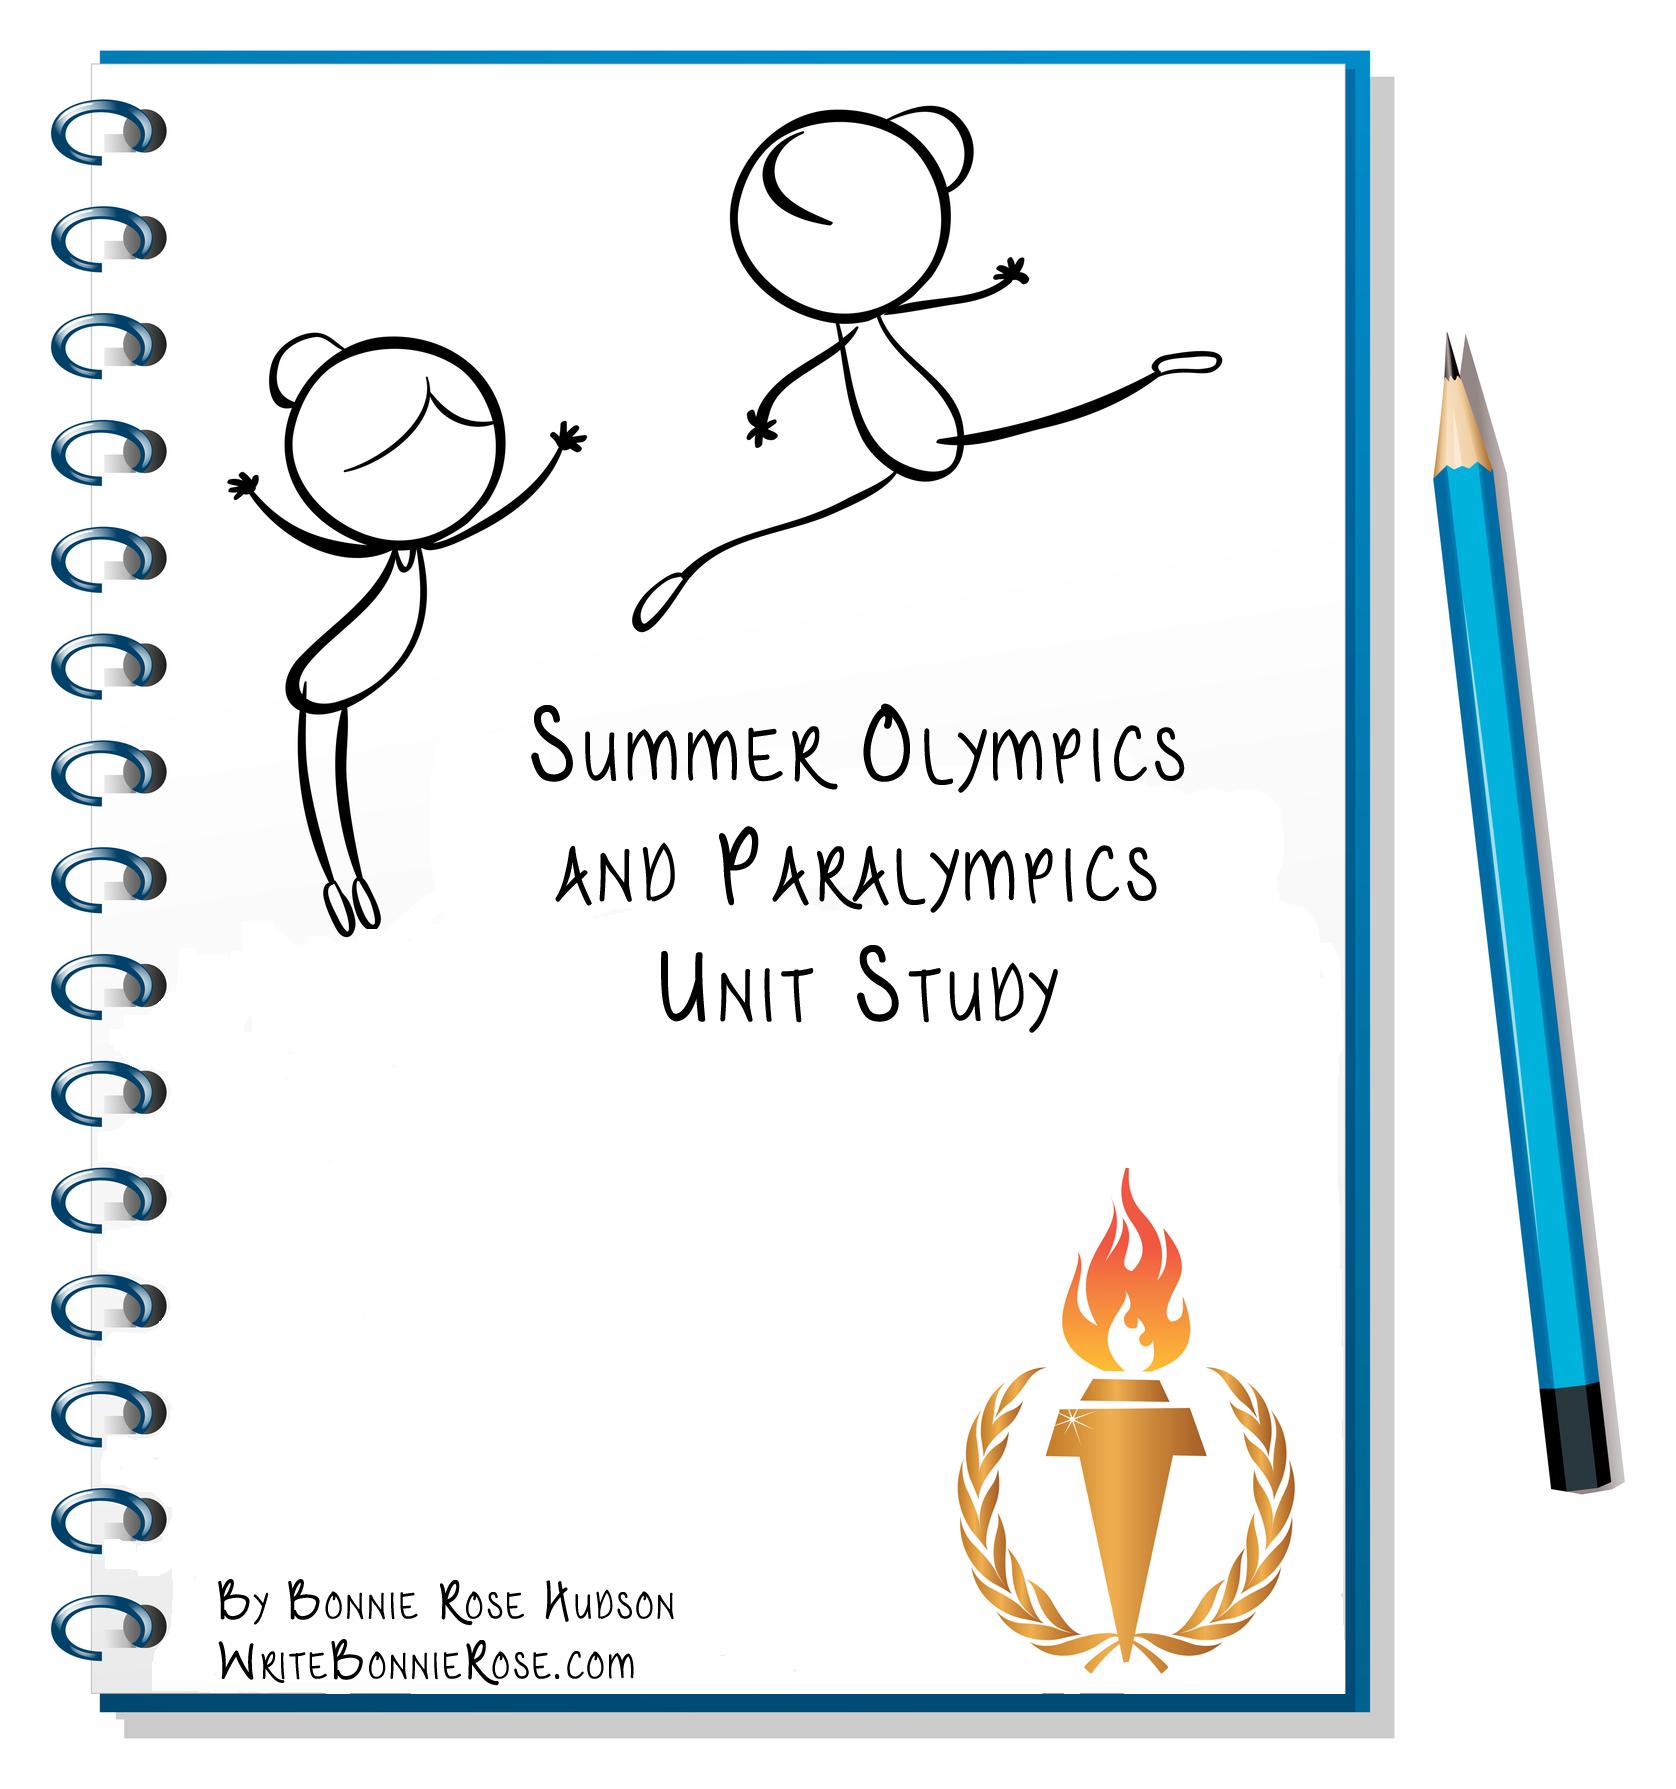 Summer Olympics And Paralympics Unit Study Writebonnierose Com Study Unit Paralympics Spelling Activities [ 1789 x 1676 Pixel ]